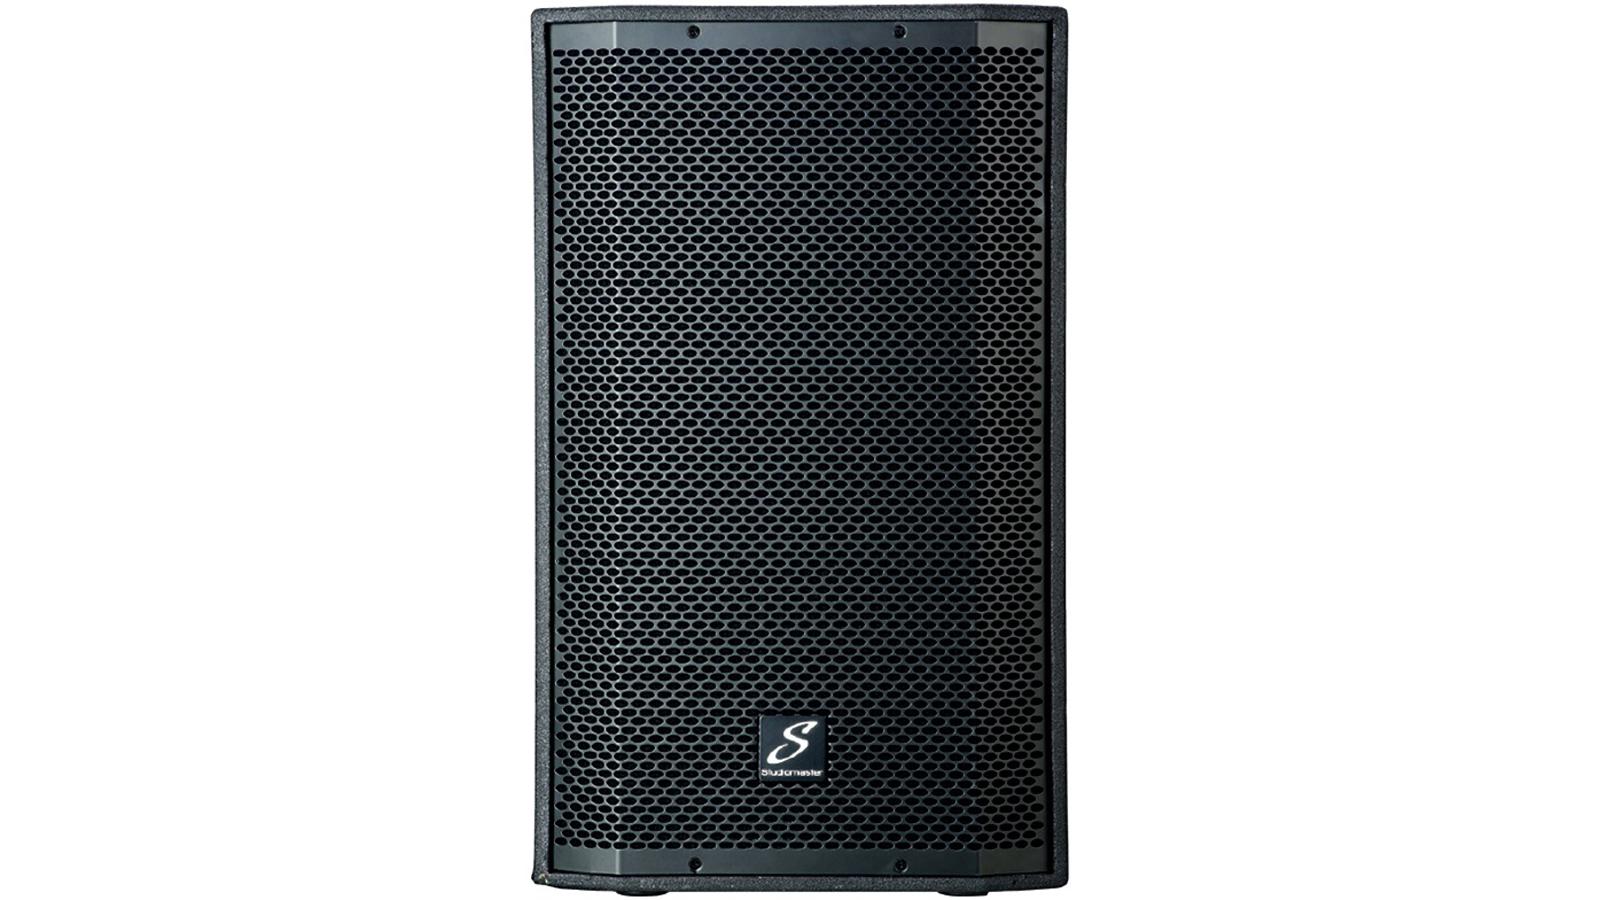 StudioMaster VENTURE 12AP 12 Zoll 2-Wege Aktive Lautsprecherbox mit DSP